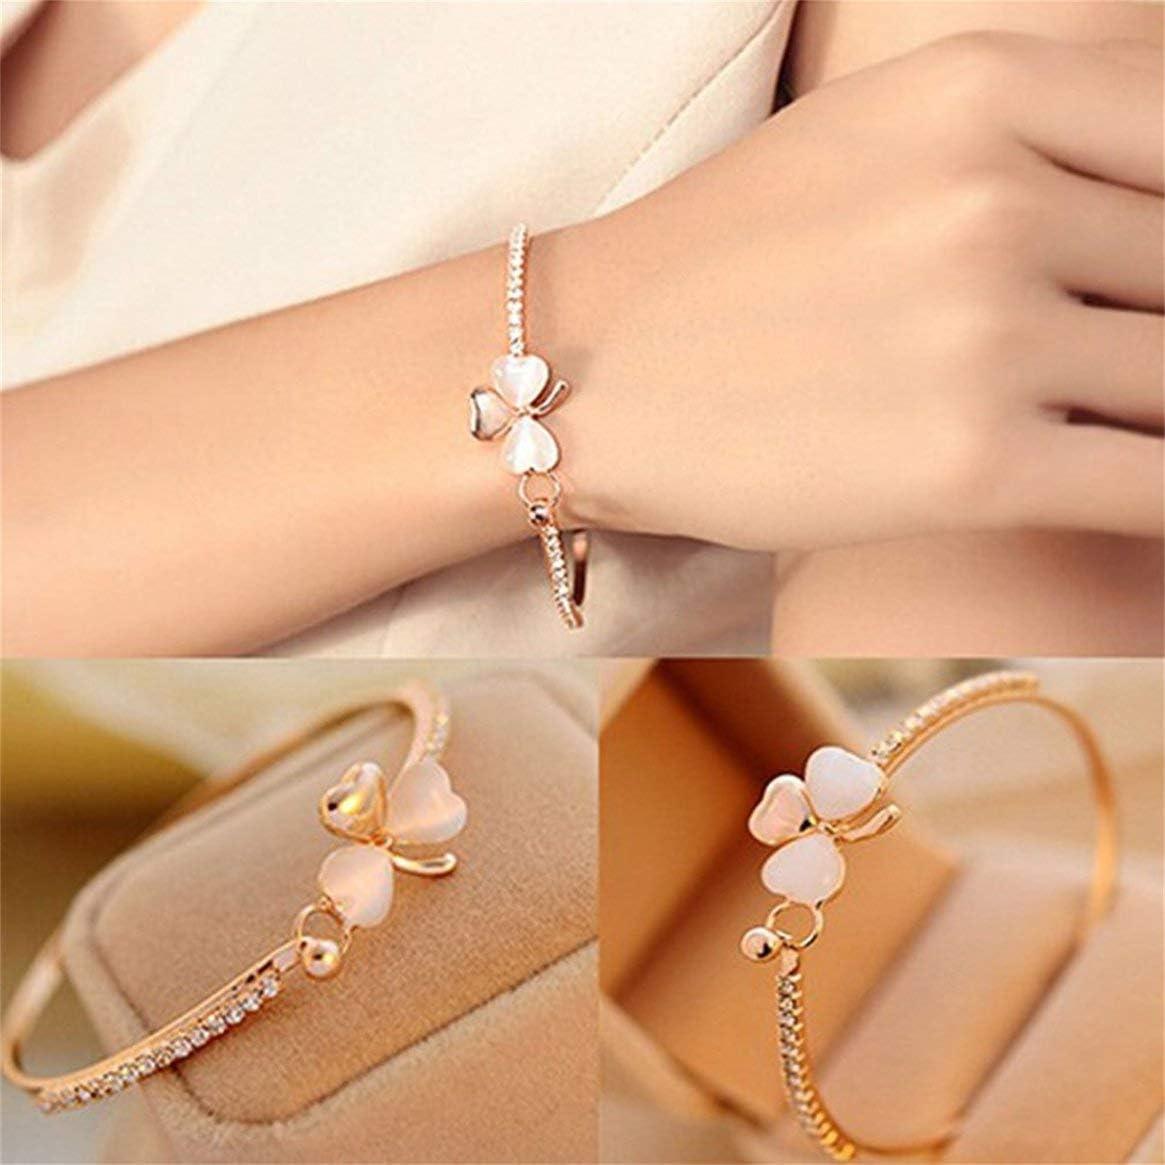 Kongqiabona-UK High-end design ladies clover bracelet elegant ladies wild clothes bracelet bracelet bracelet beautiful jewelry gift